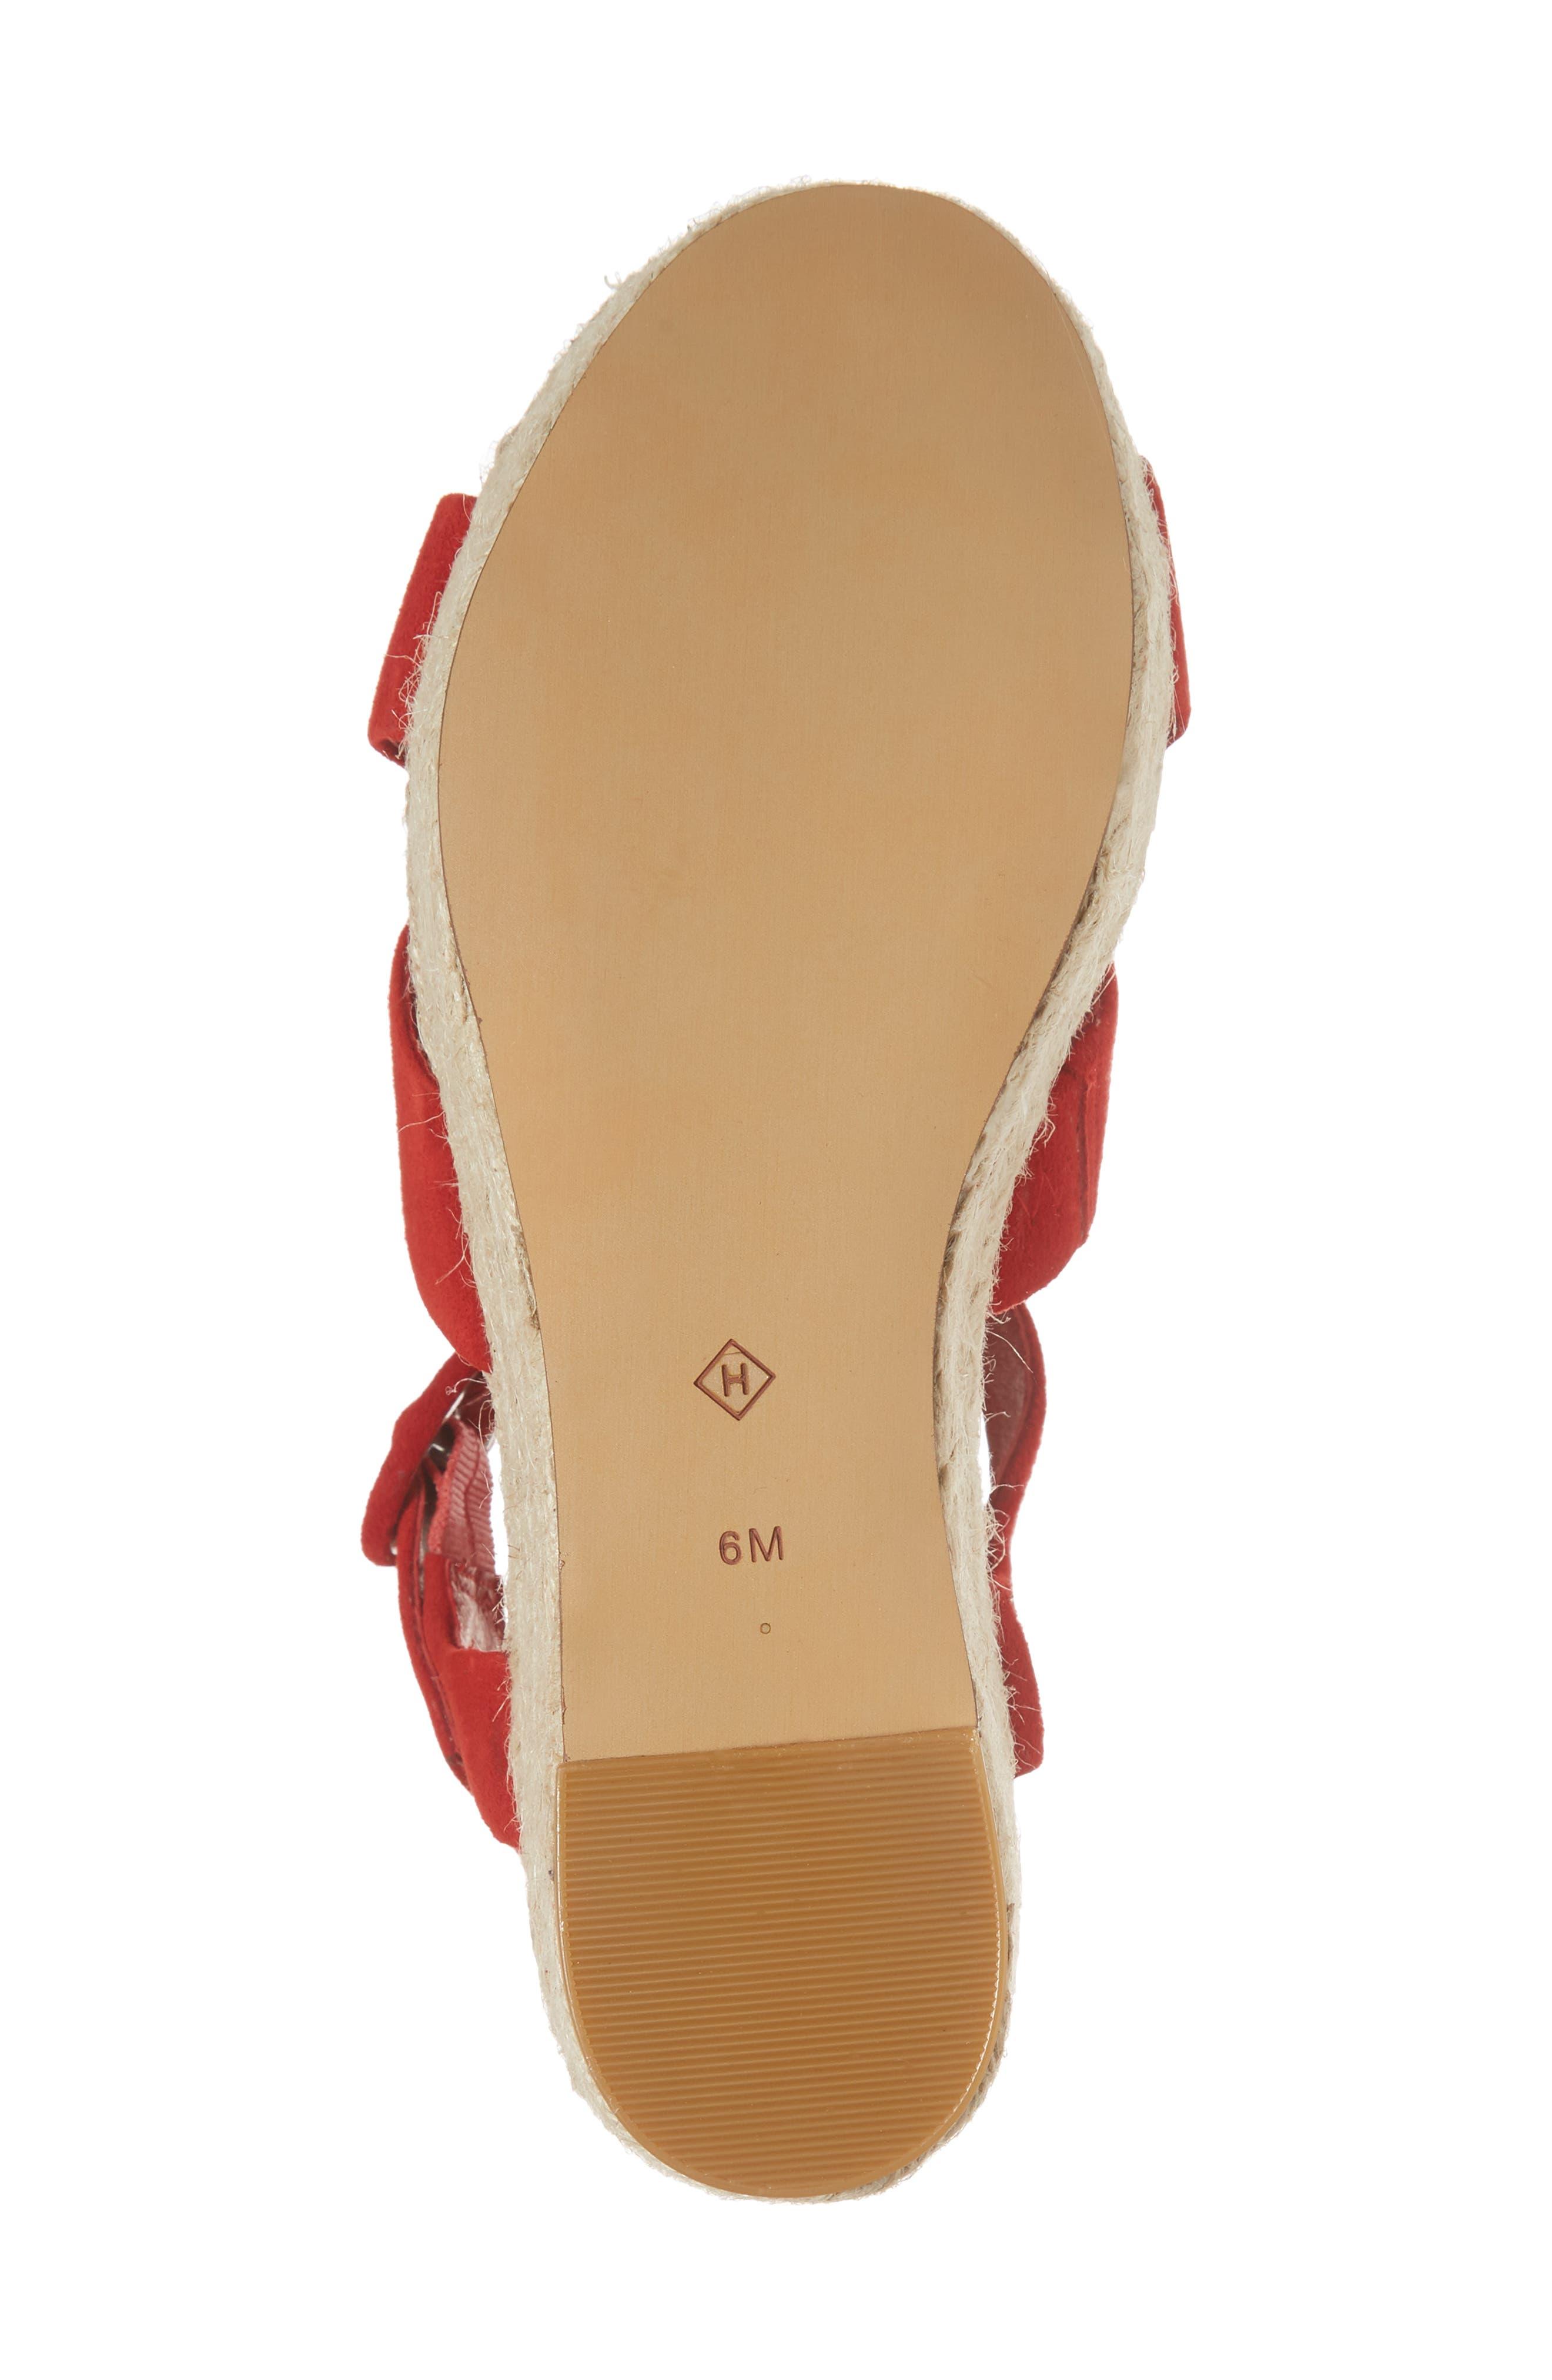 Emery Platform Espadrille Sandal,                             Alternate thumbnail 7, color,                             Red Suede